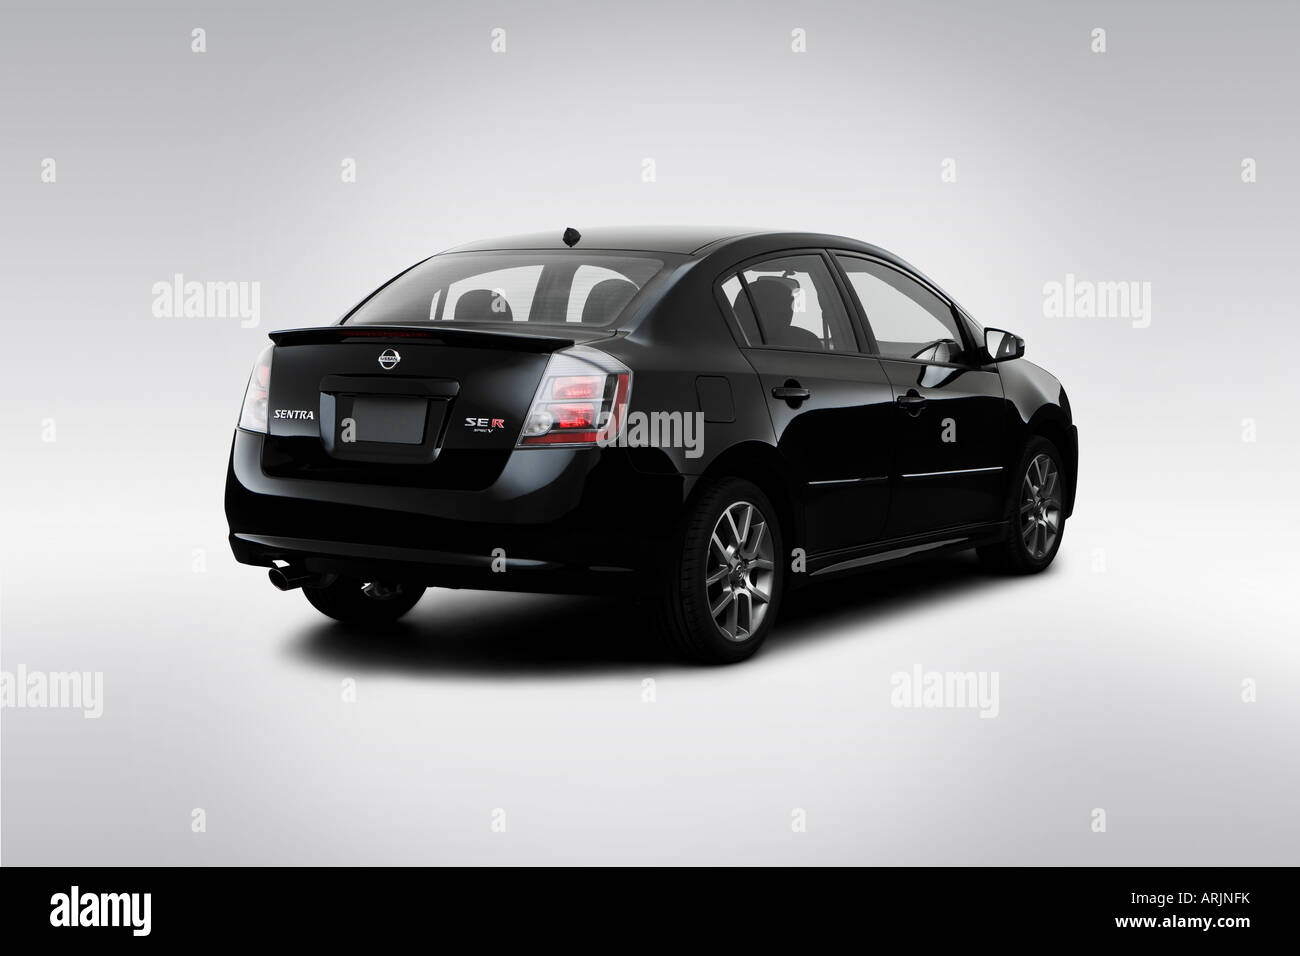 2008 Nissan Sentra Se R Spec V In Black Rear Angle View Stock Photo Alamy